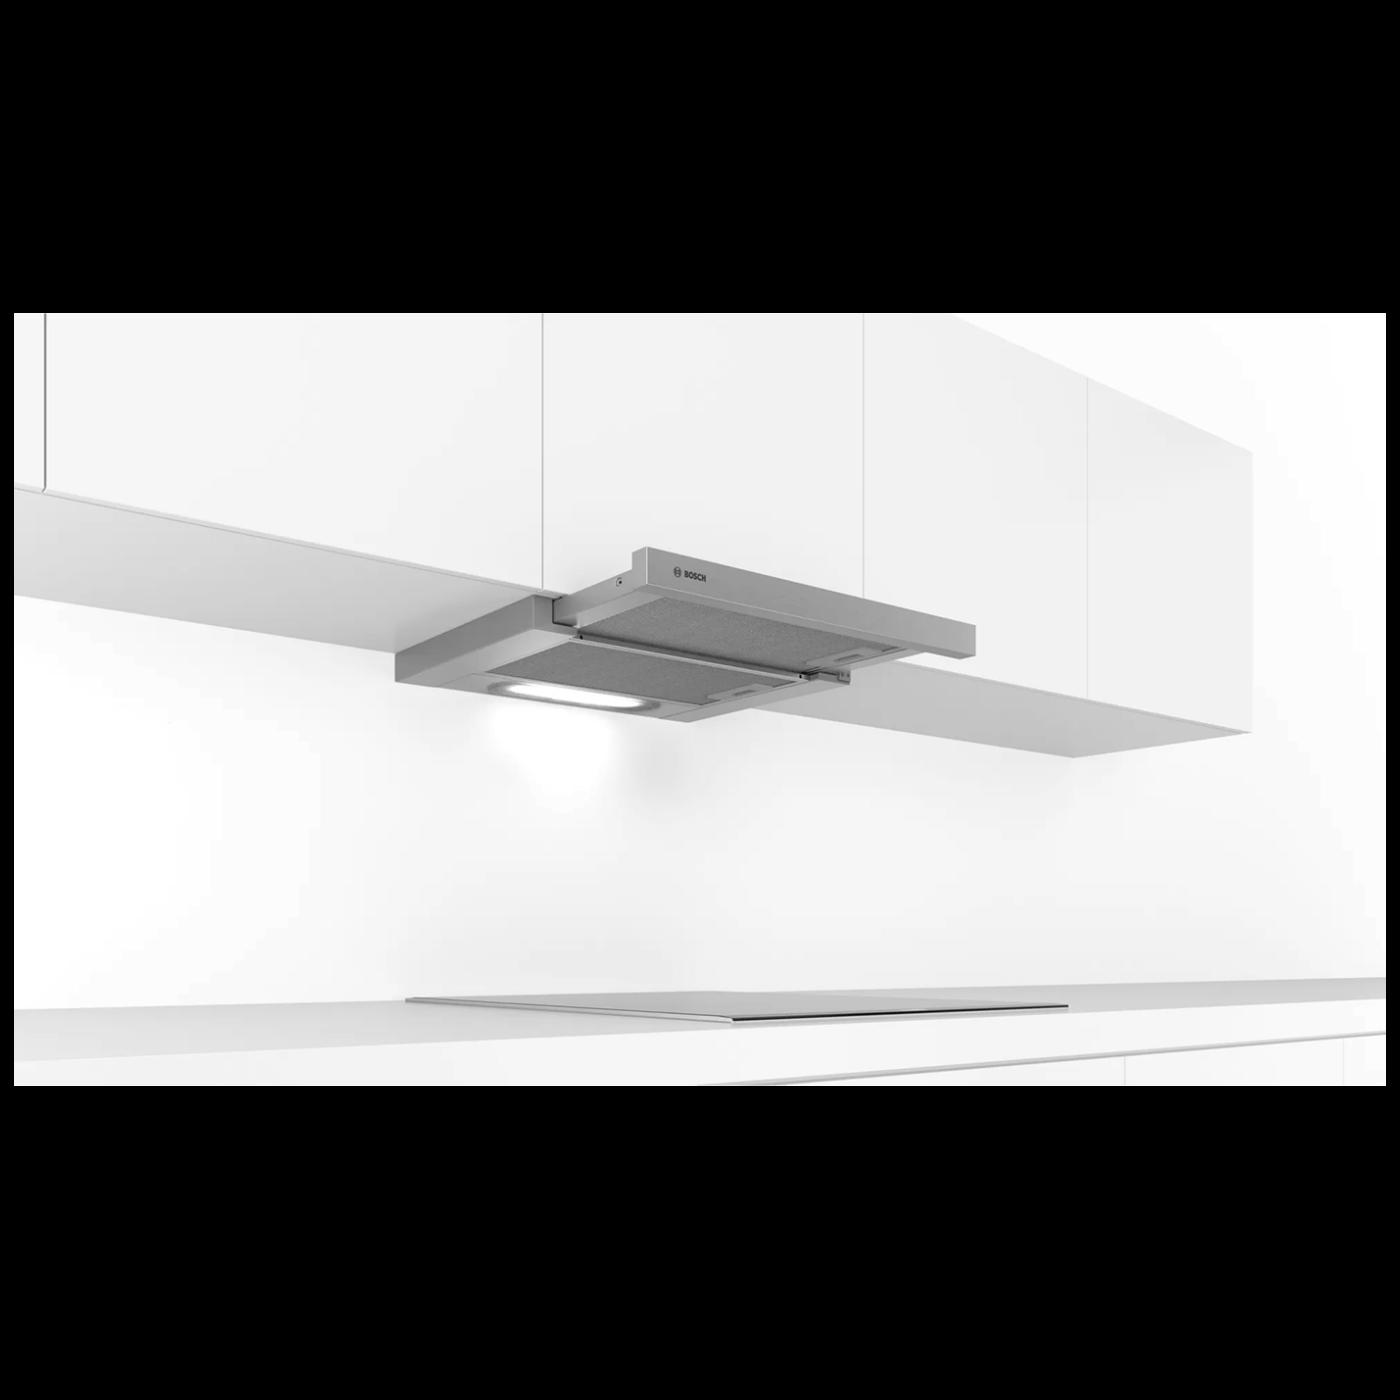 Kuhinjska napa, ugradbena, 146 W, boja siva